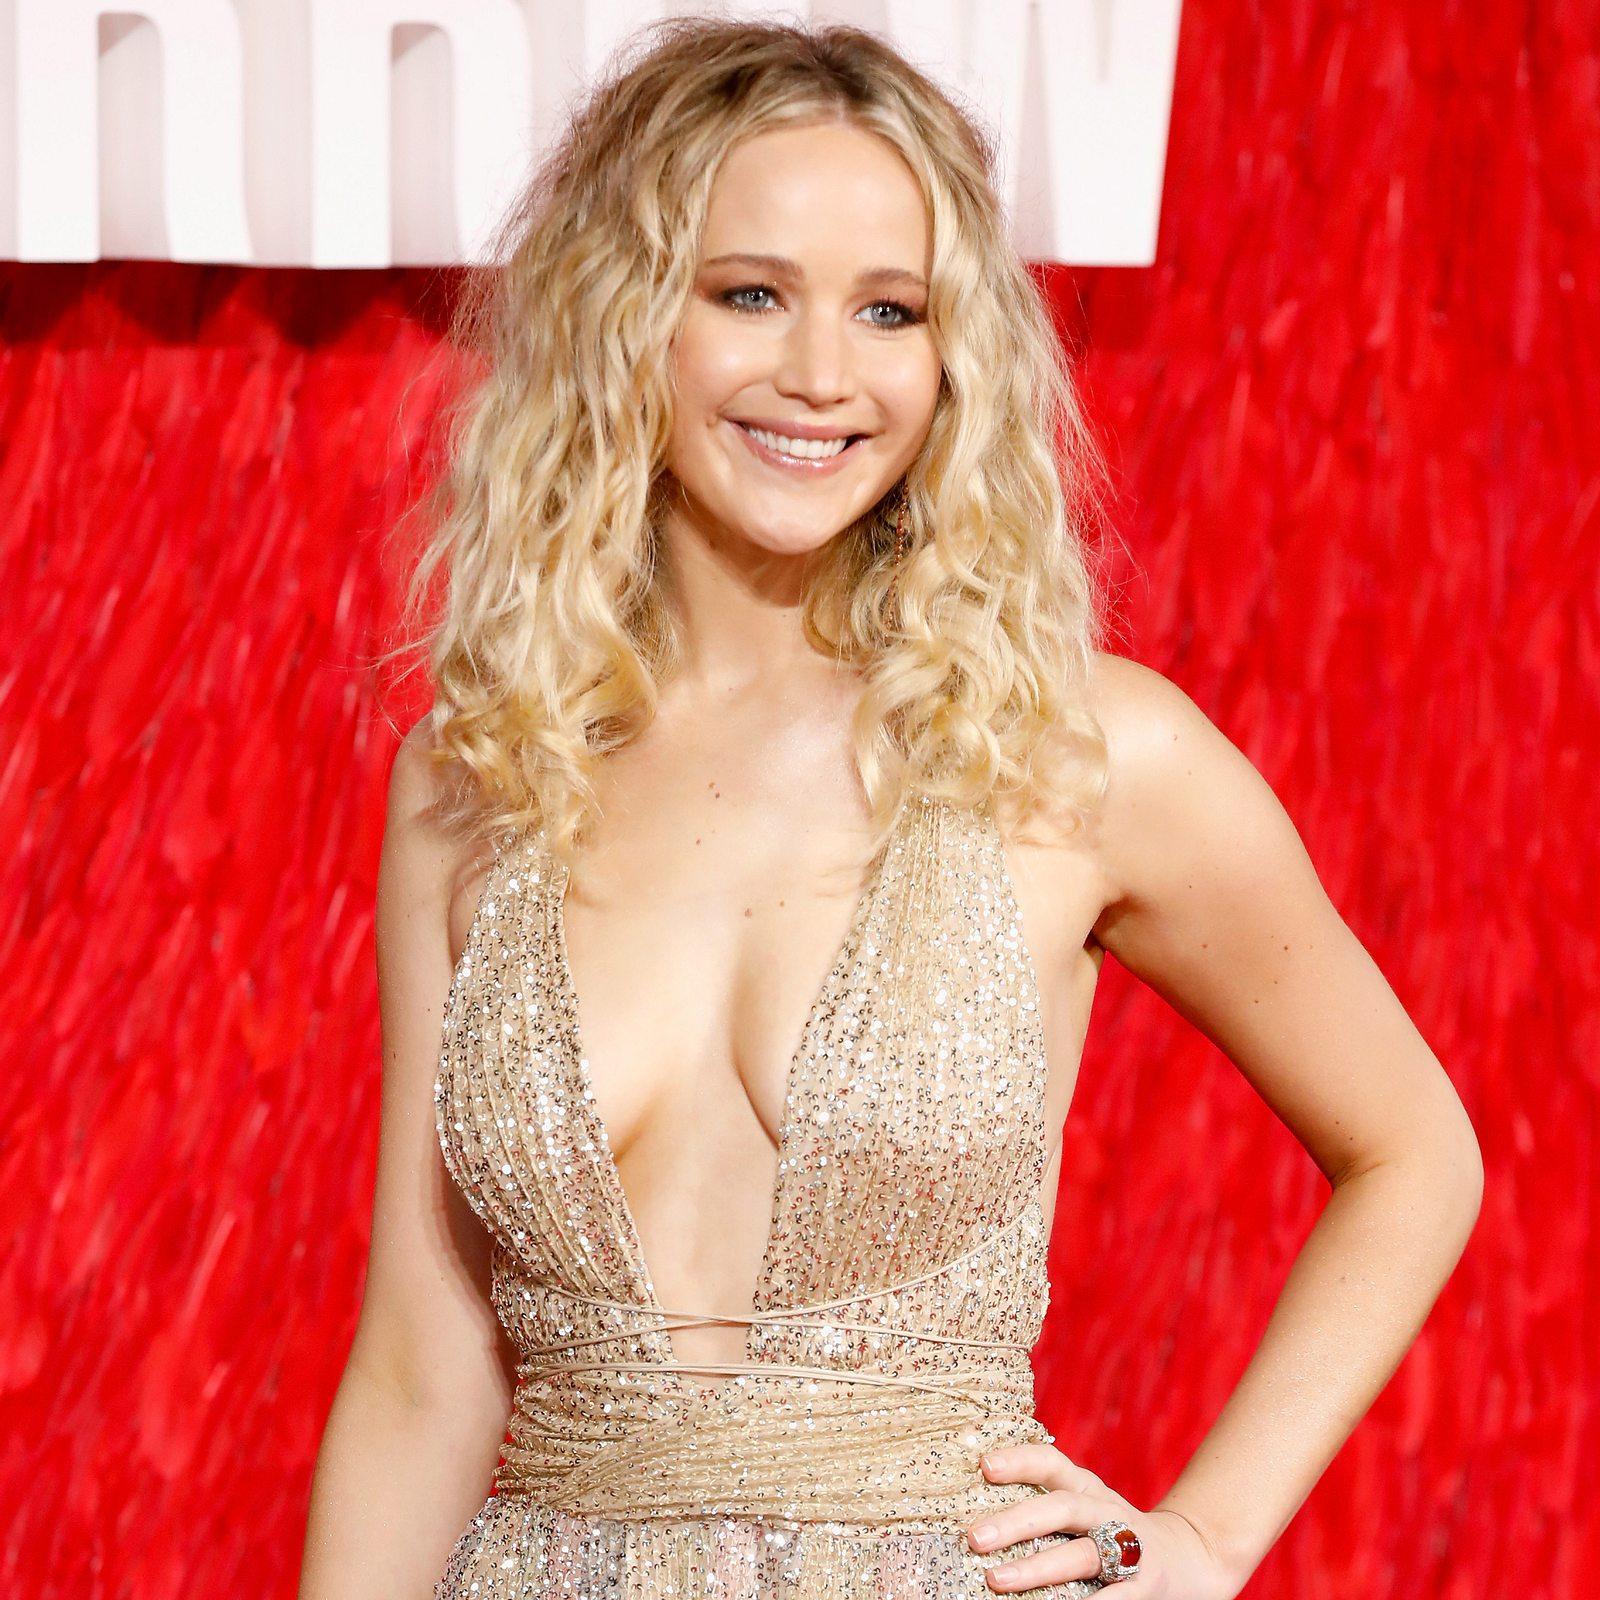 Jennifer Lawrence Bio, Childhood, affairs, Career and More